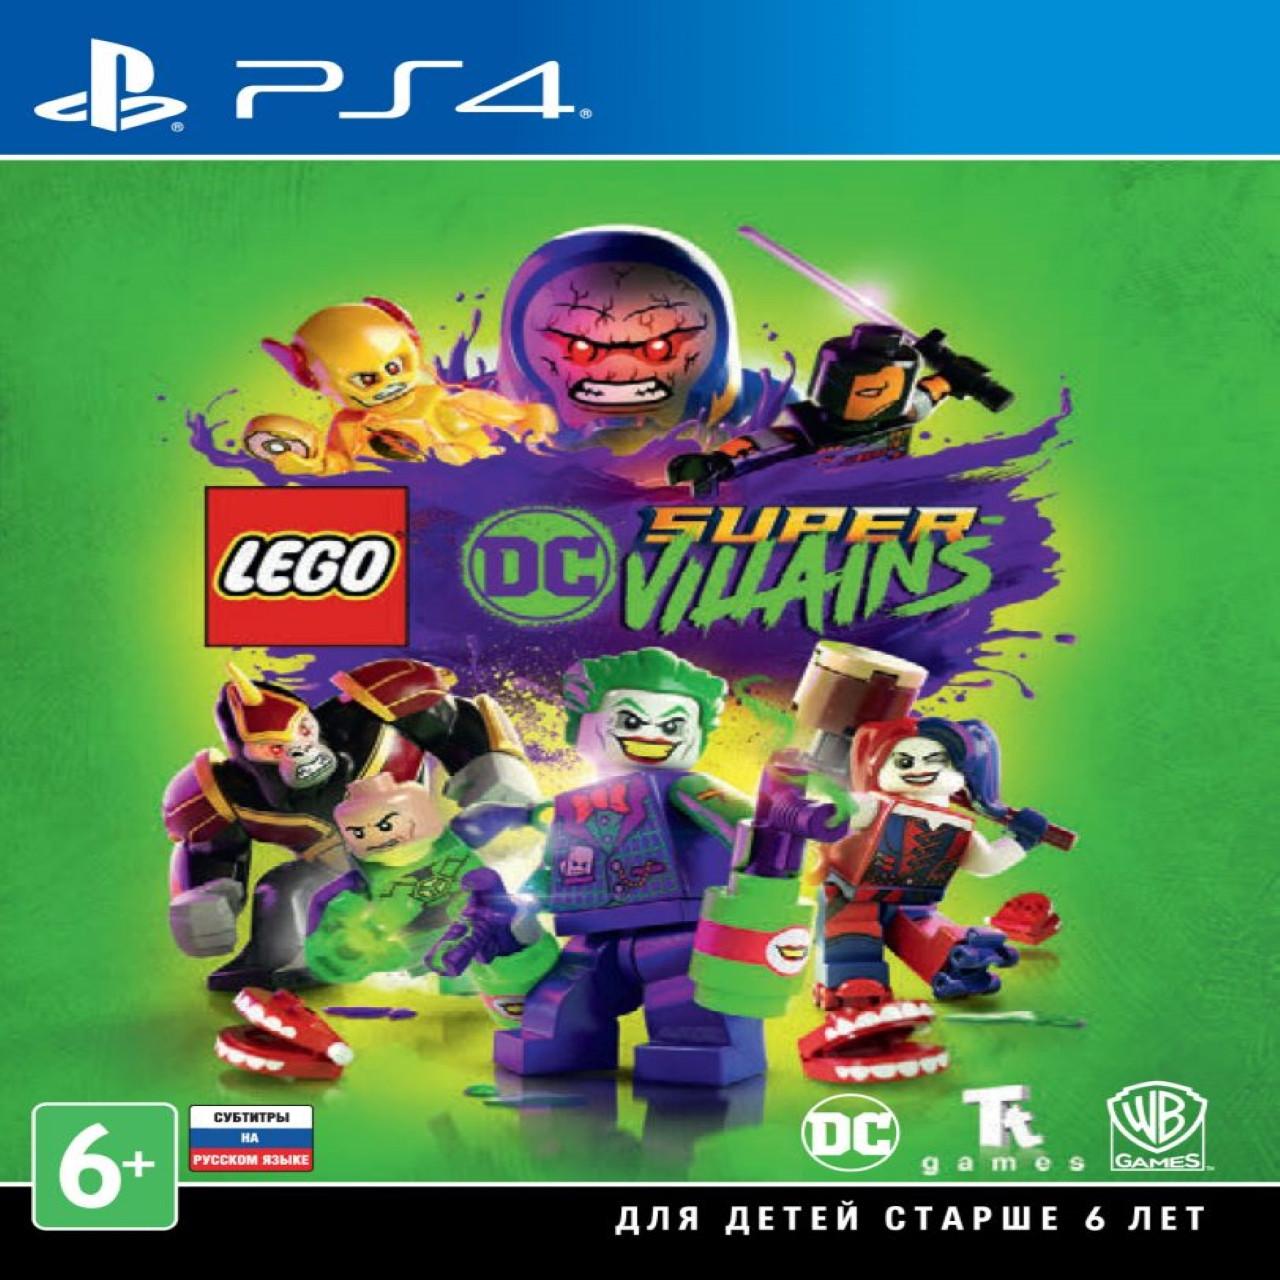 Lego DC Super Villains SUB PS4